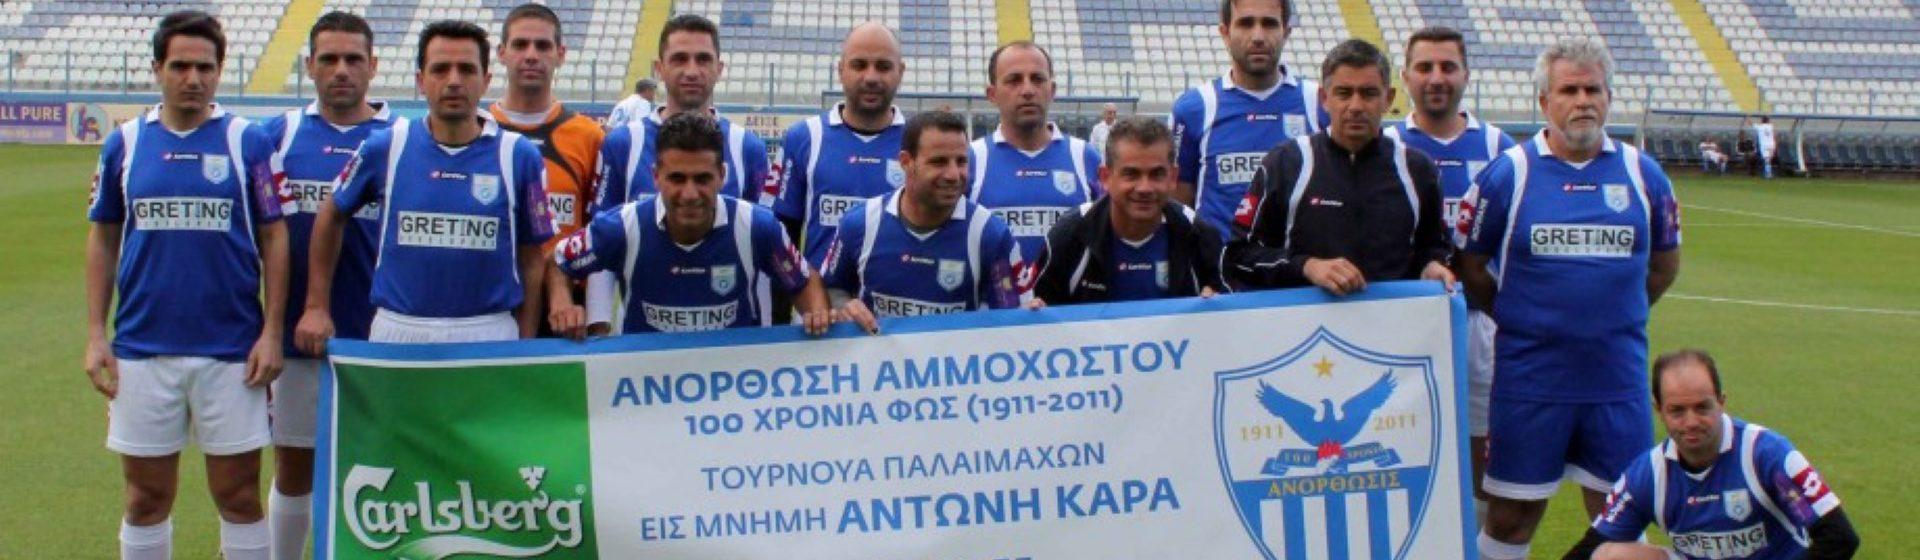 Anorthosis Famagusta FC header